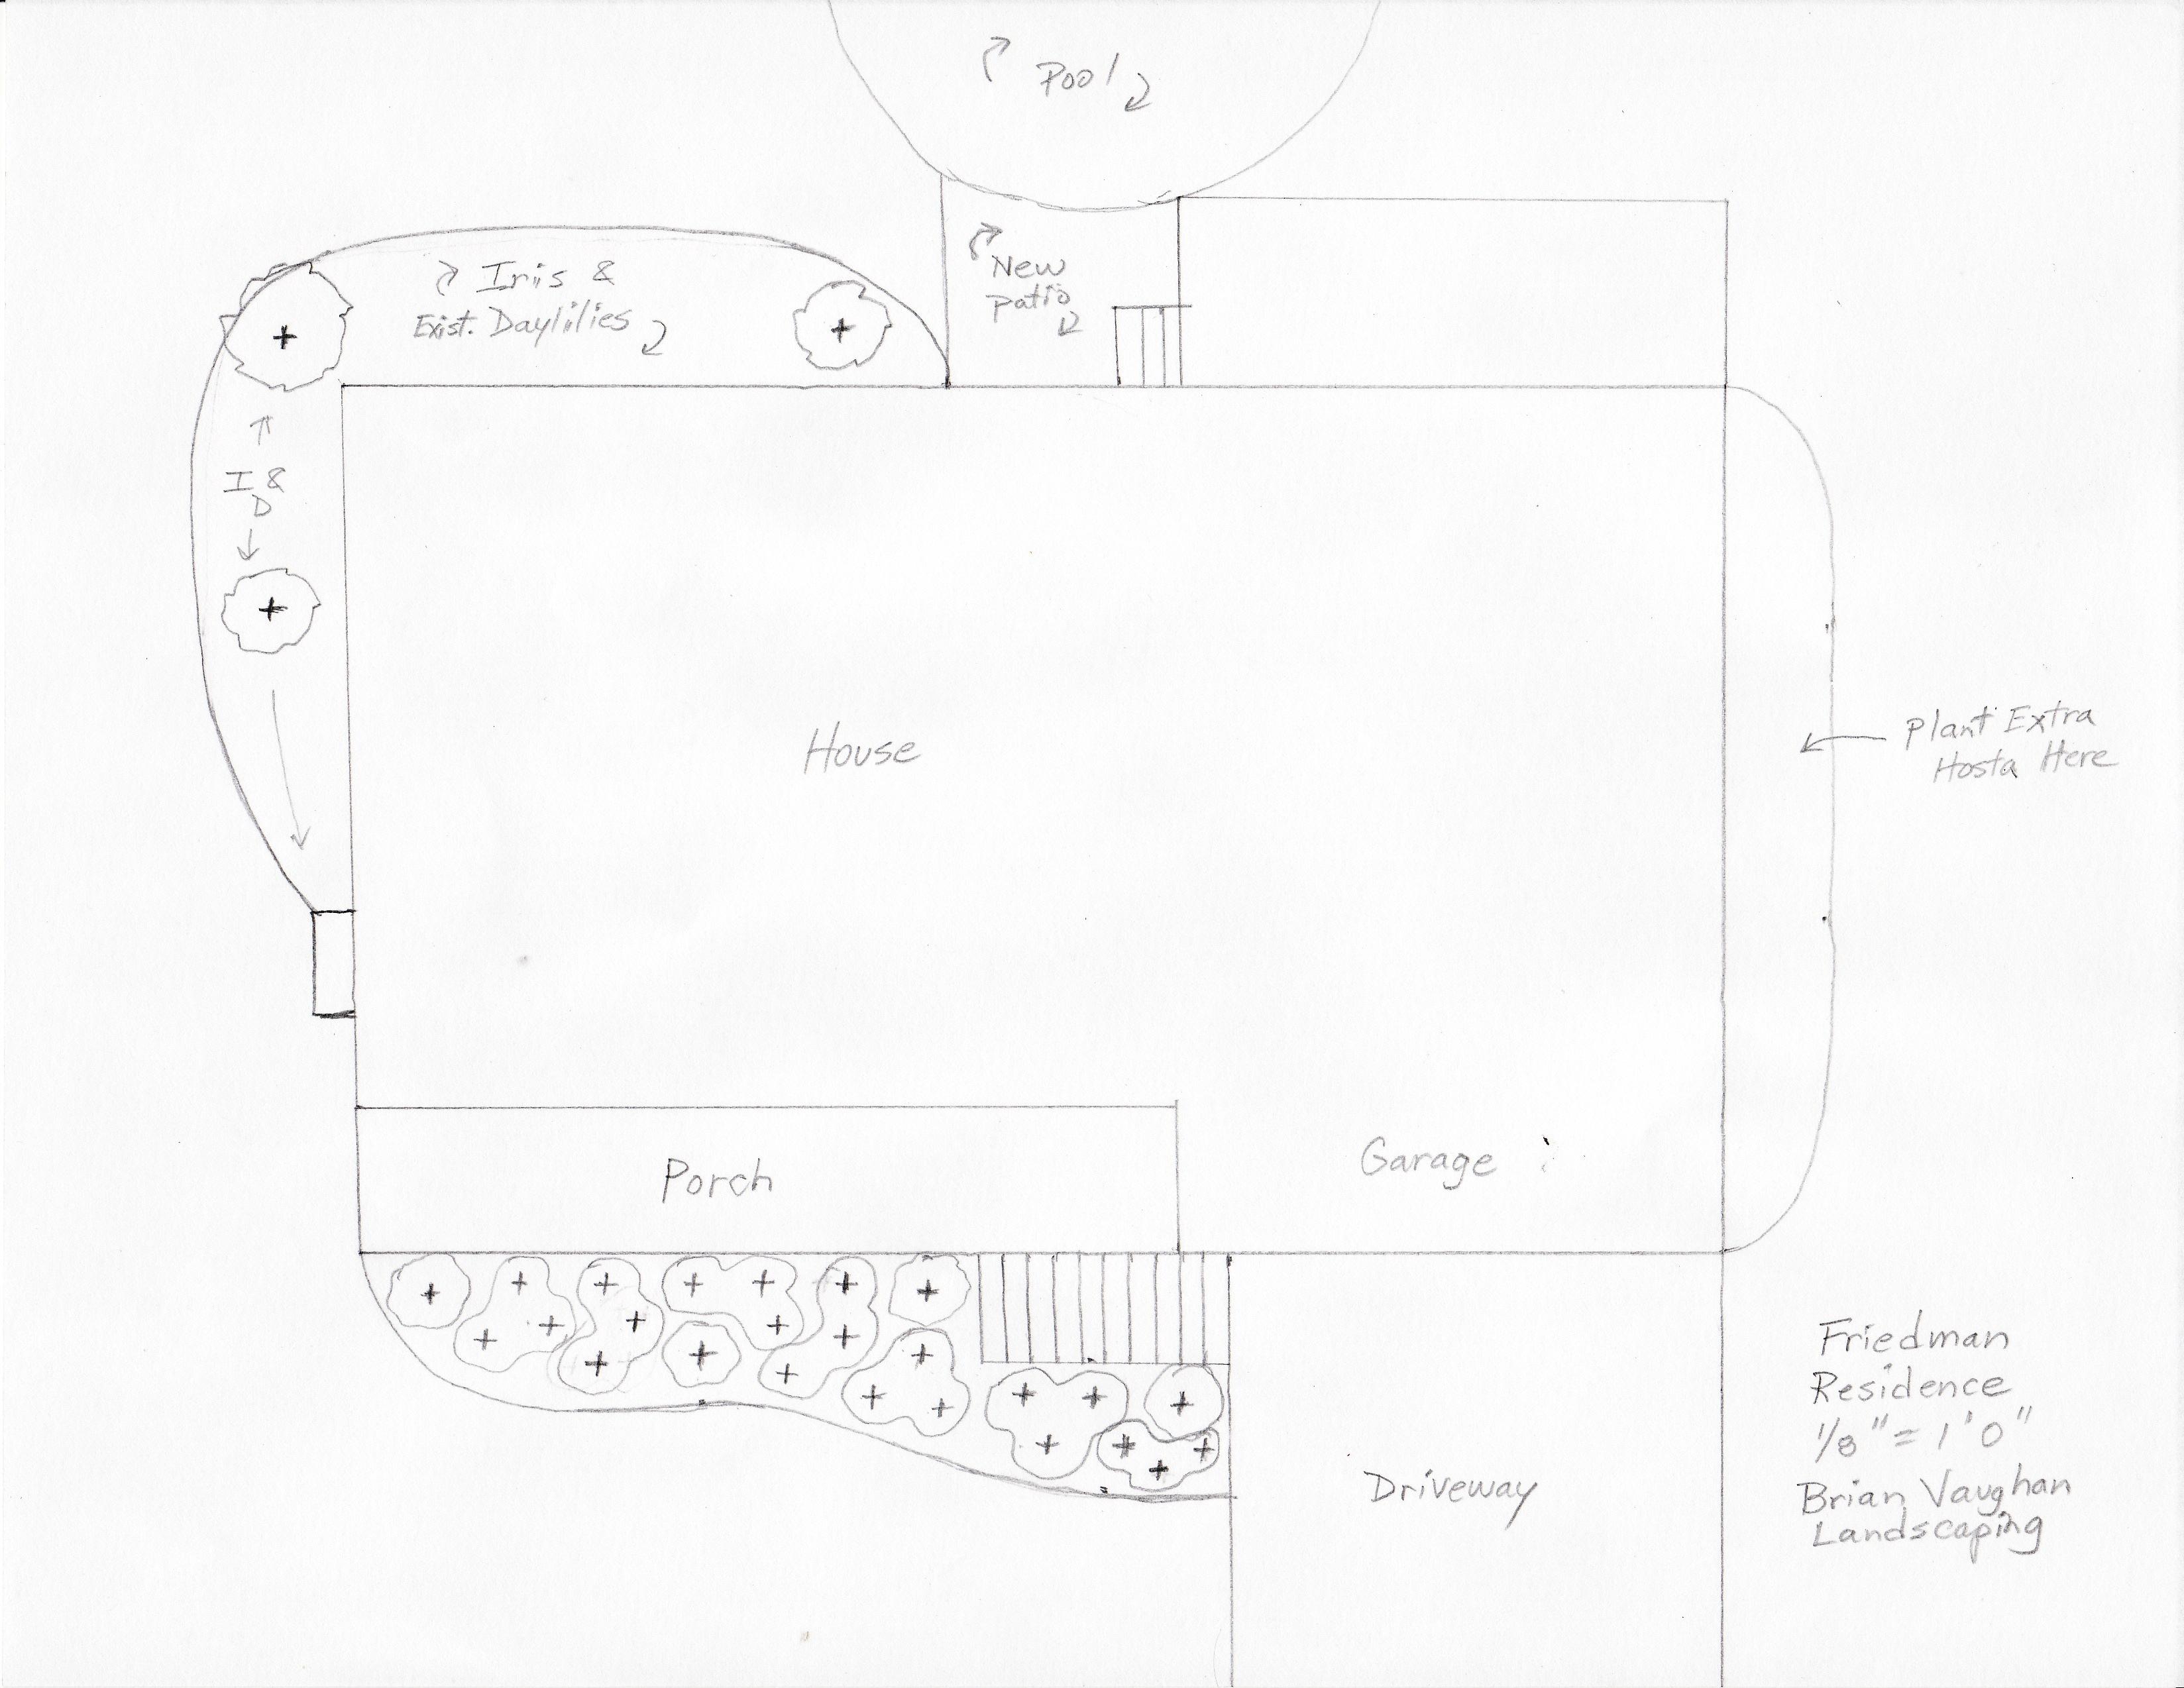 Foundation Planting Design